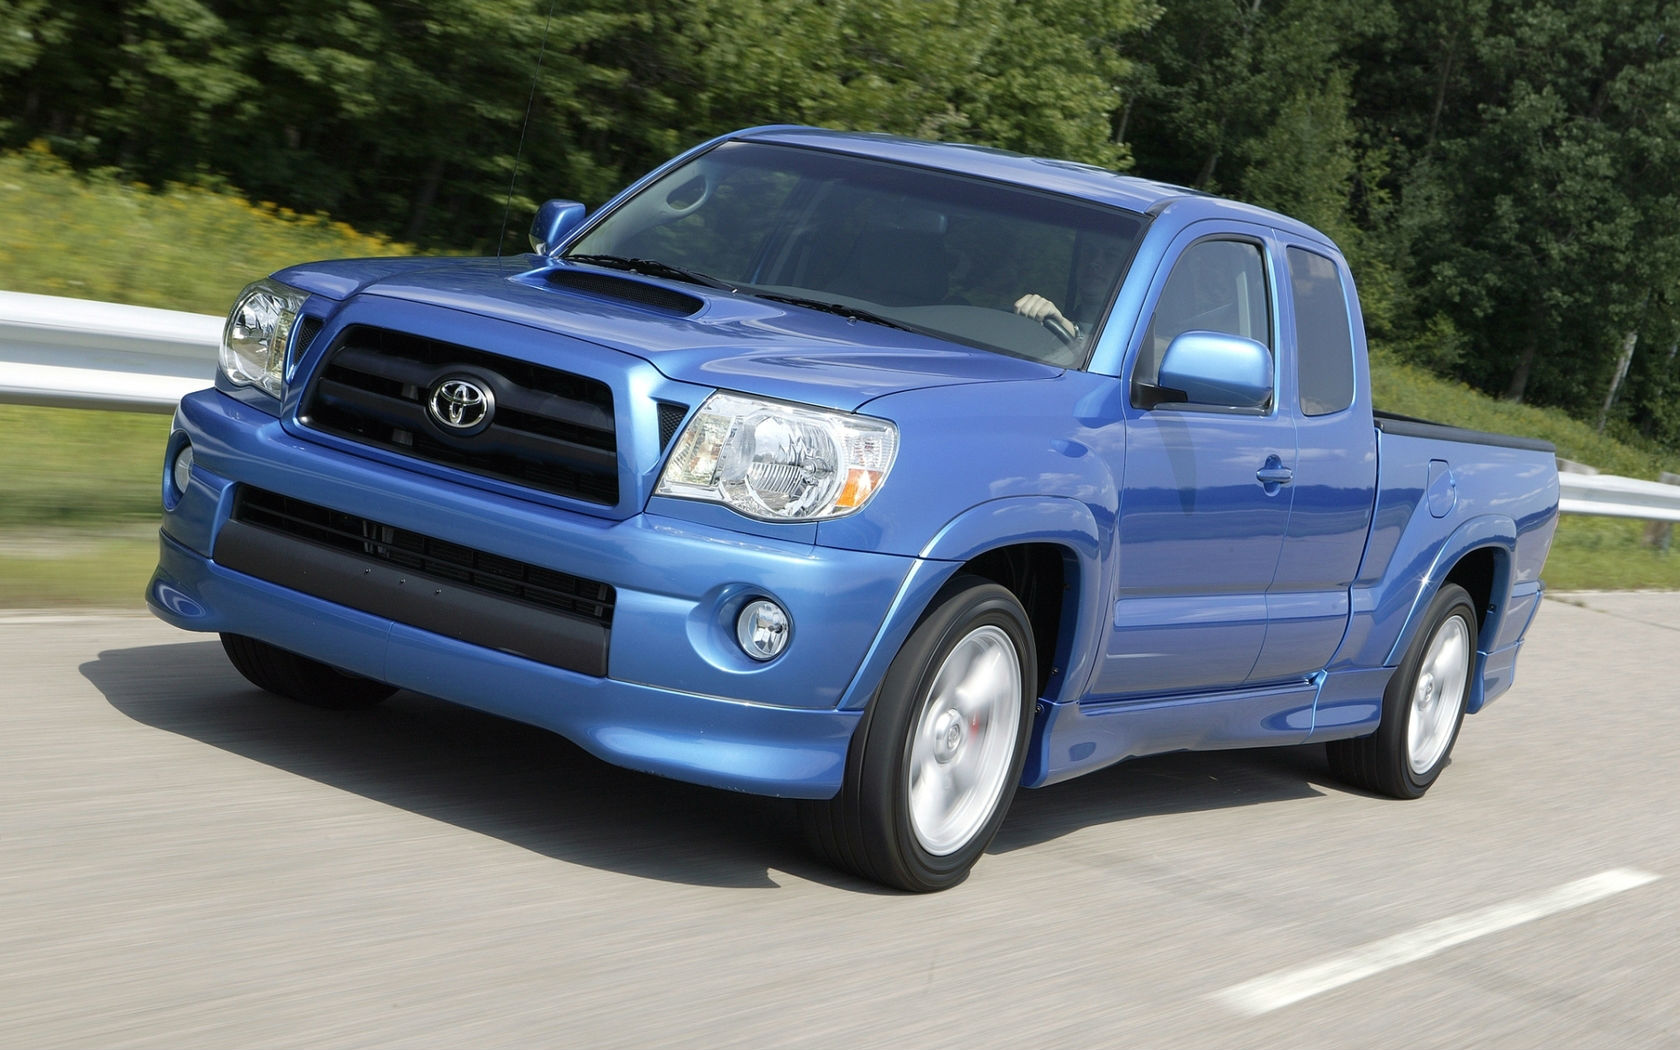 Toyota SUV Car Wallpaper 1680x1050 1680x1050